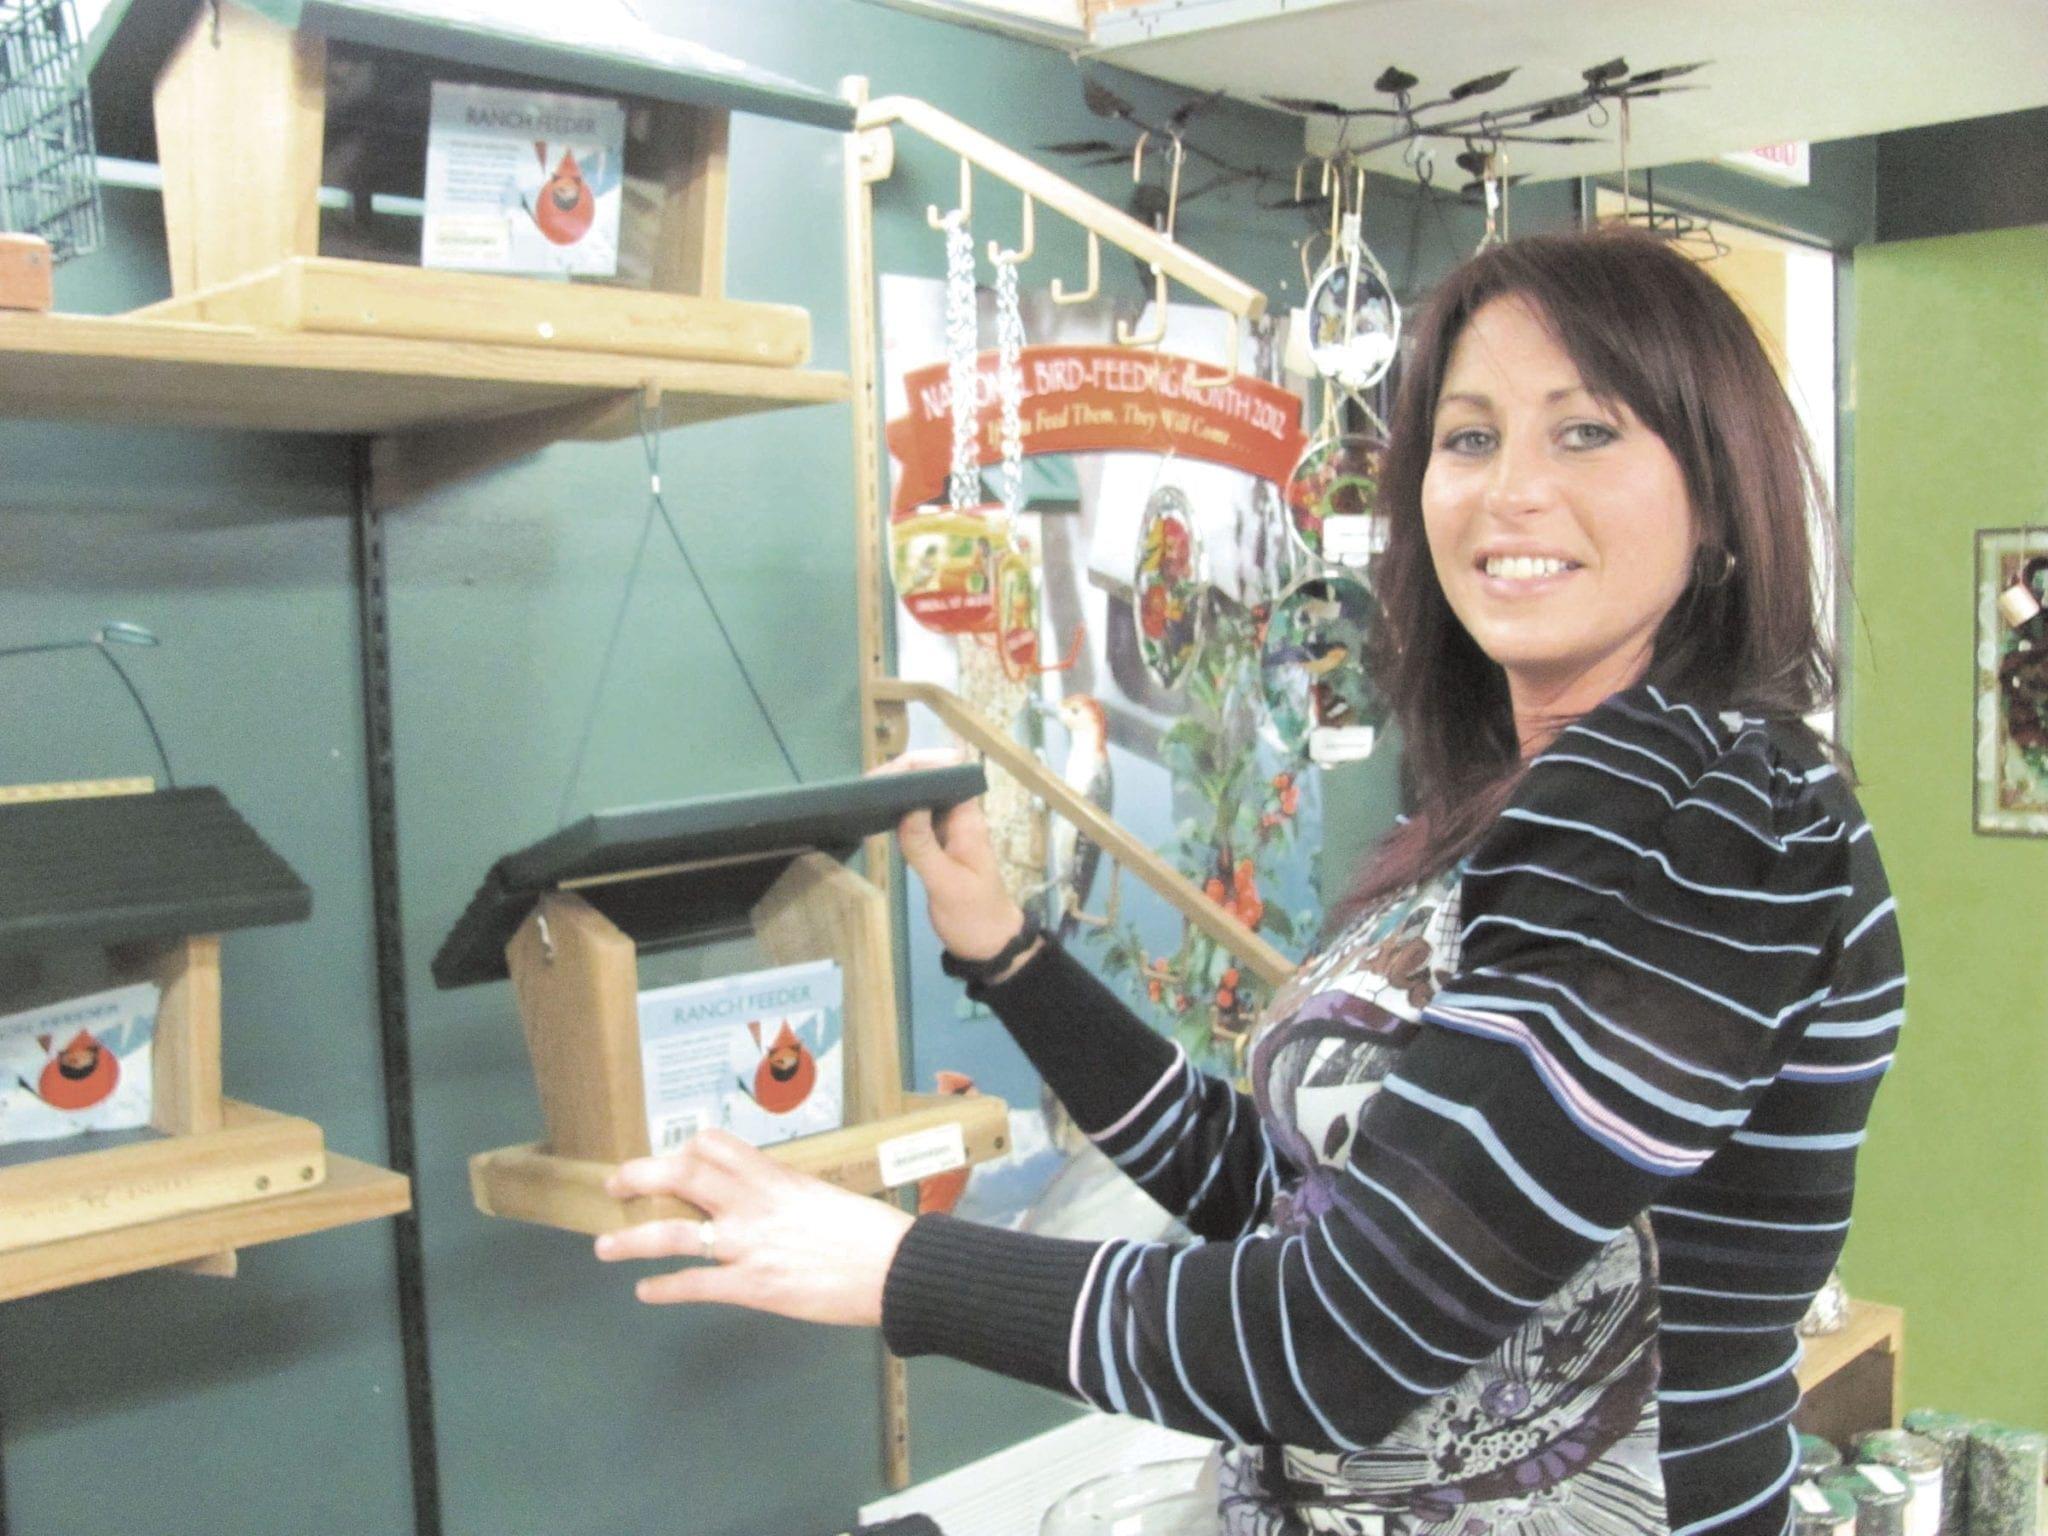 Wild Bird Center spreads its wings Seneca